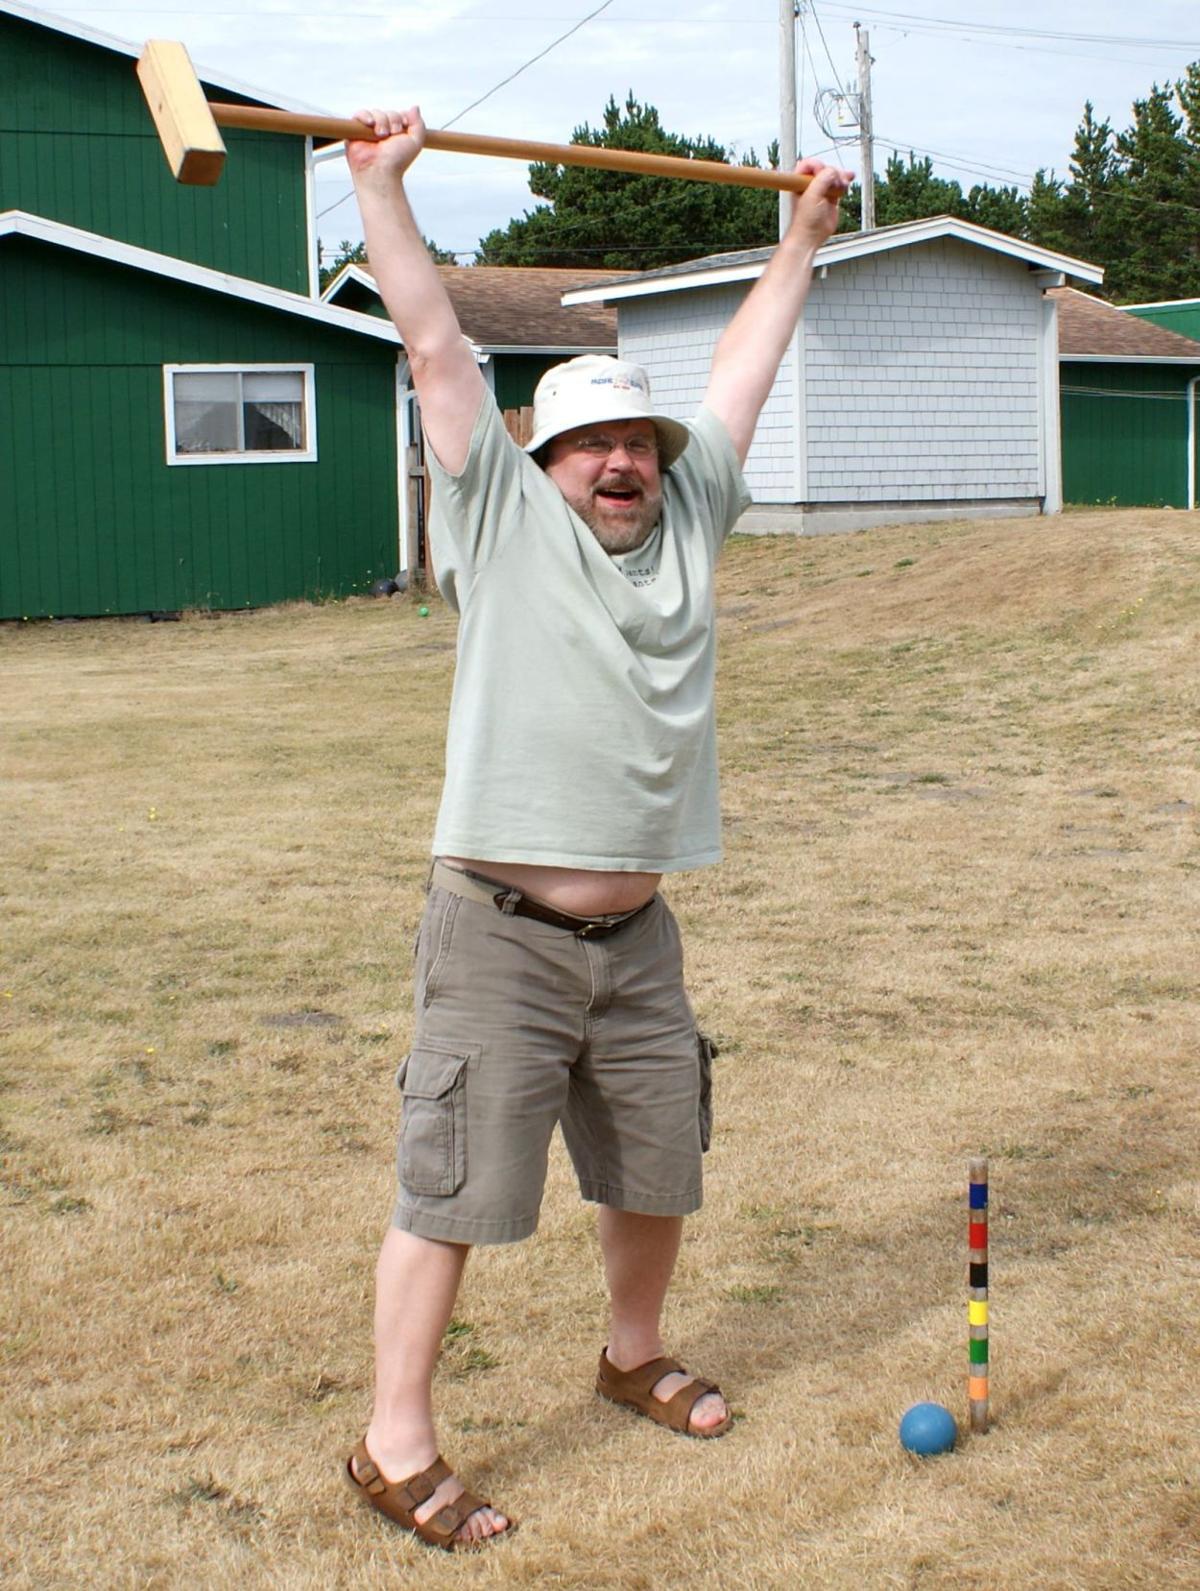 Tough-guy croquet